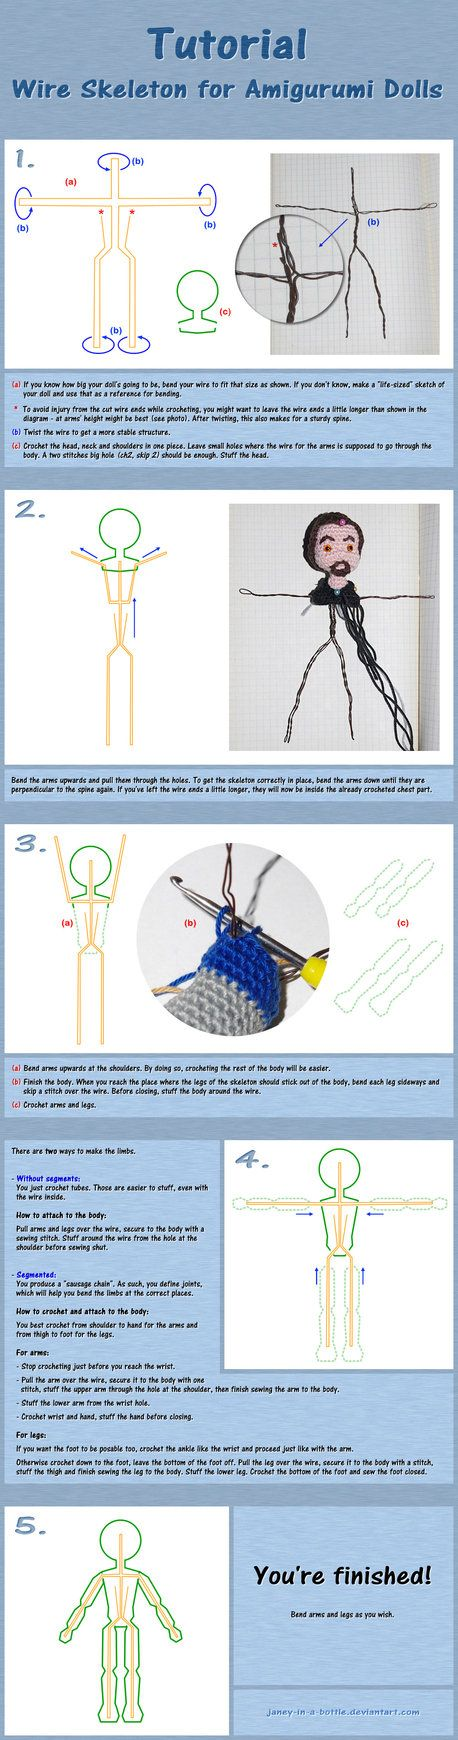 Tutorial: Wire Skeleton For Amigurumi Dolls by janey-in-a-bottle on deviantART